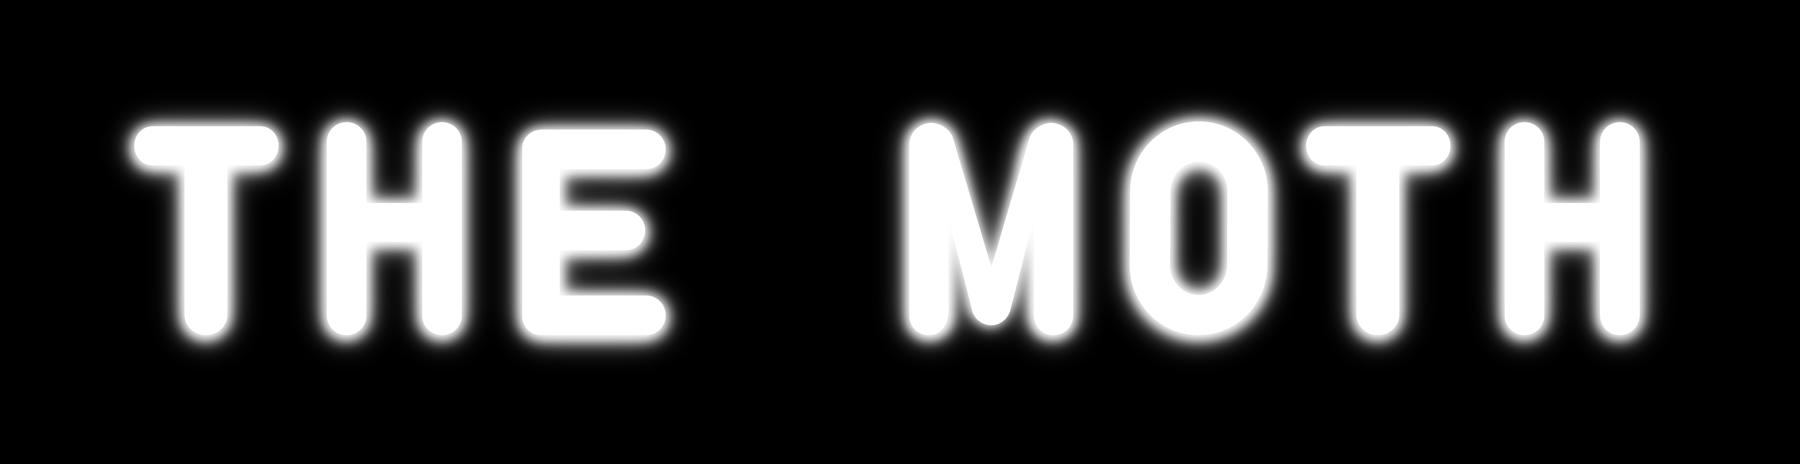 f_moth_logo